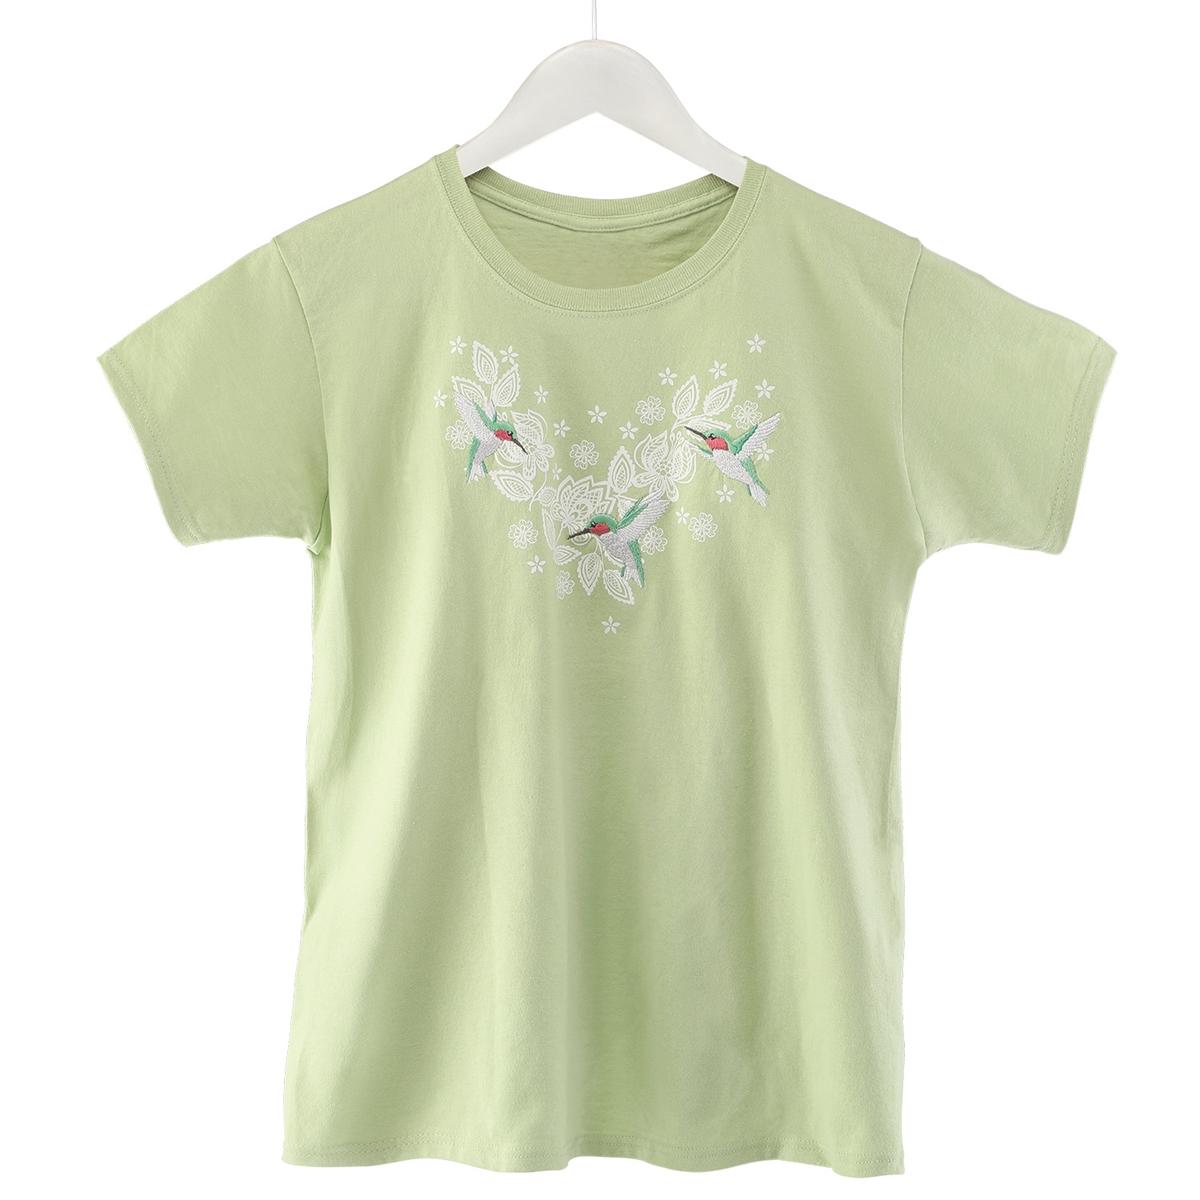 Hummingbird's Lace Tee